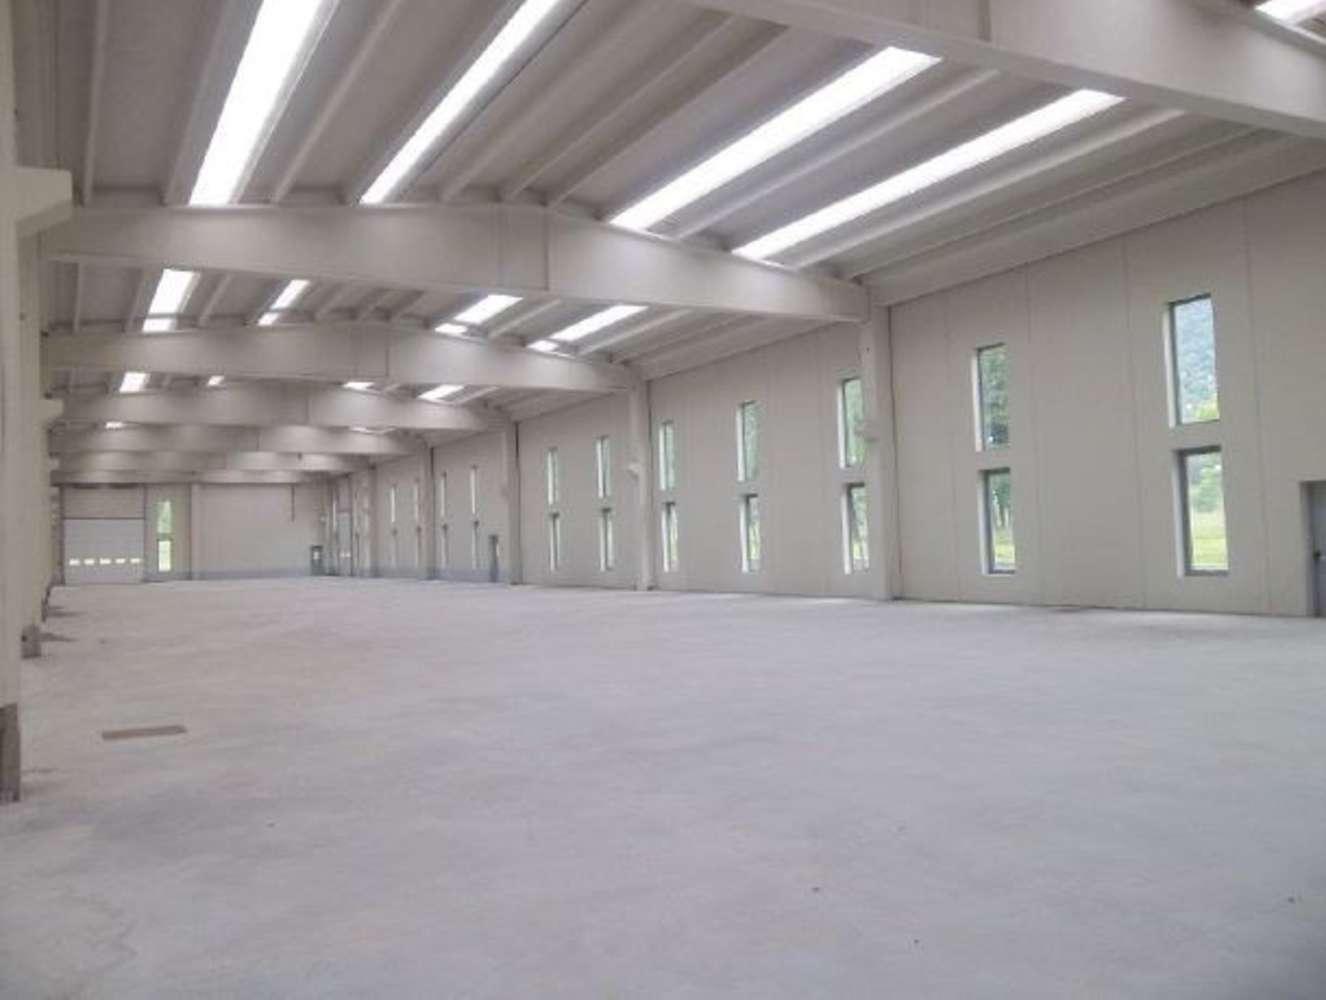 Magazzini industriali e logistici Issogne, 11020 - Capannoni logistici e uffici Aosta - 10033598